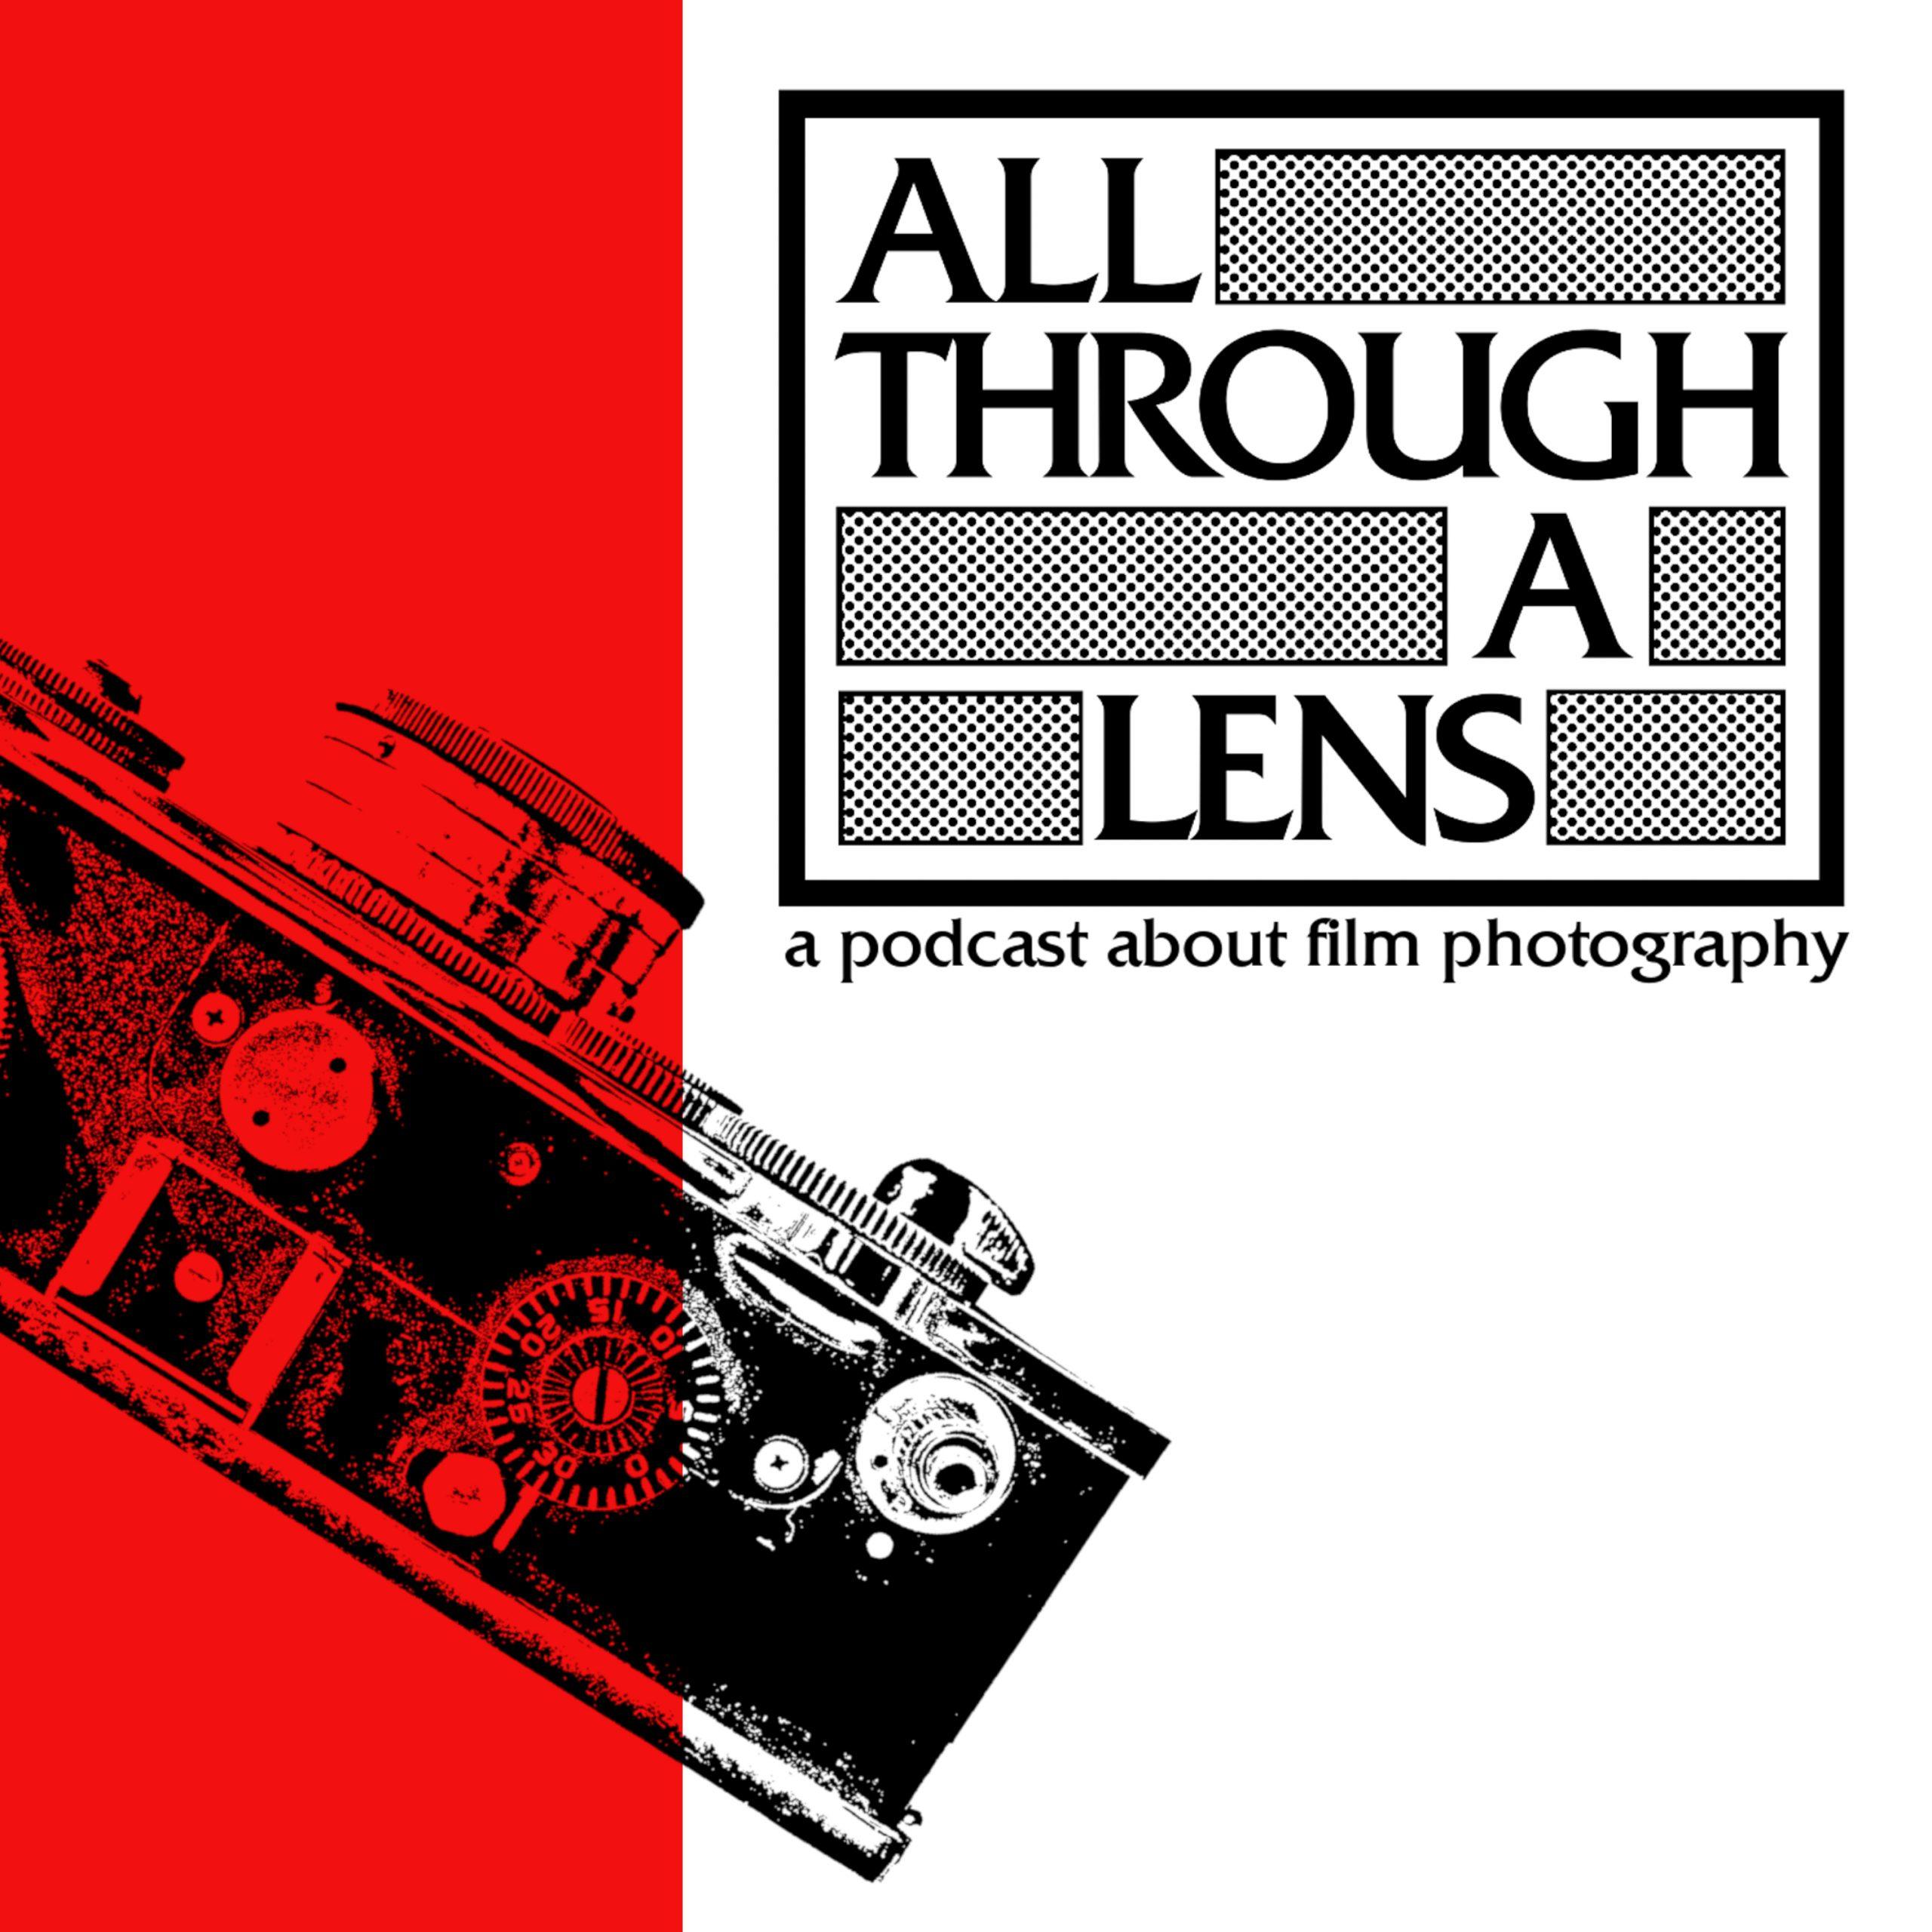 all through a lens